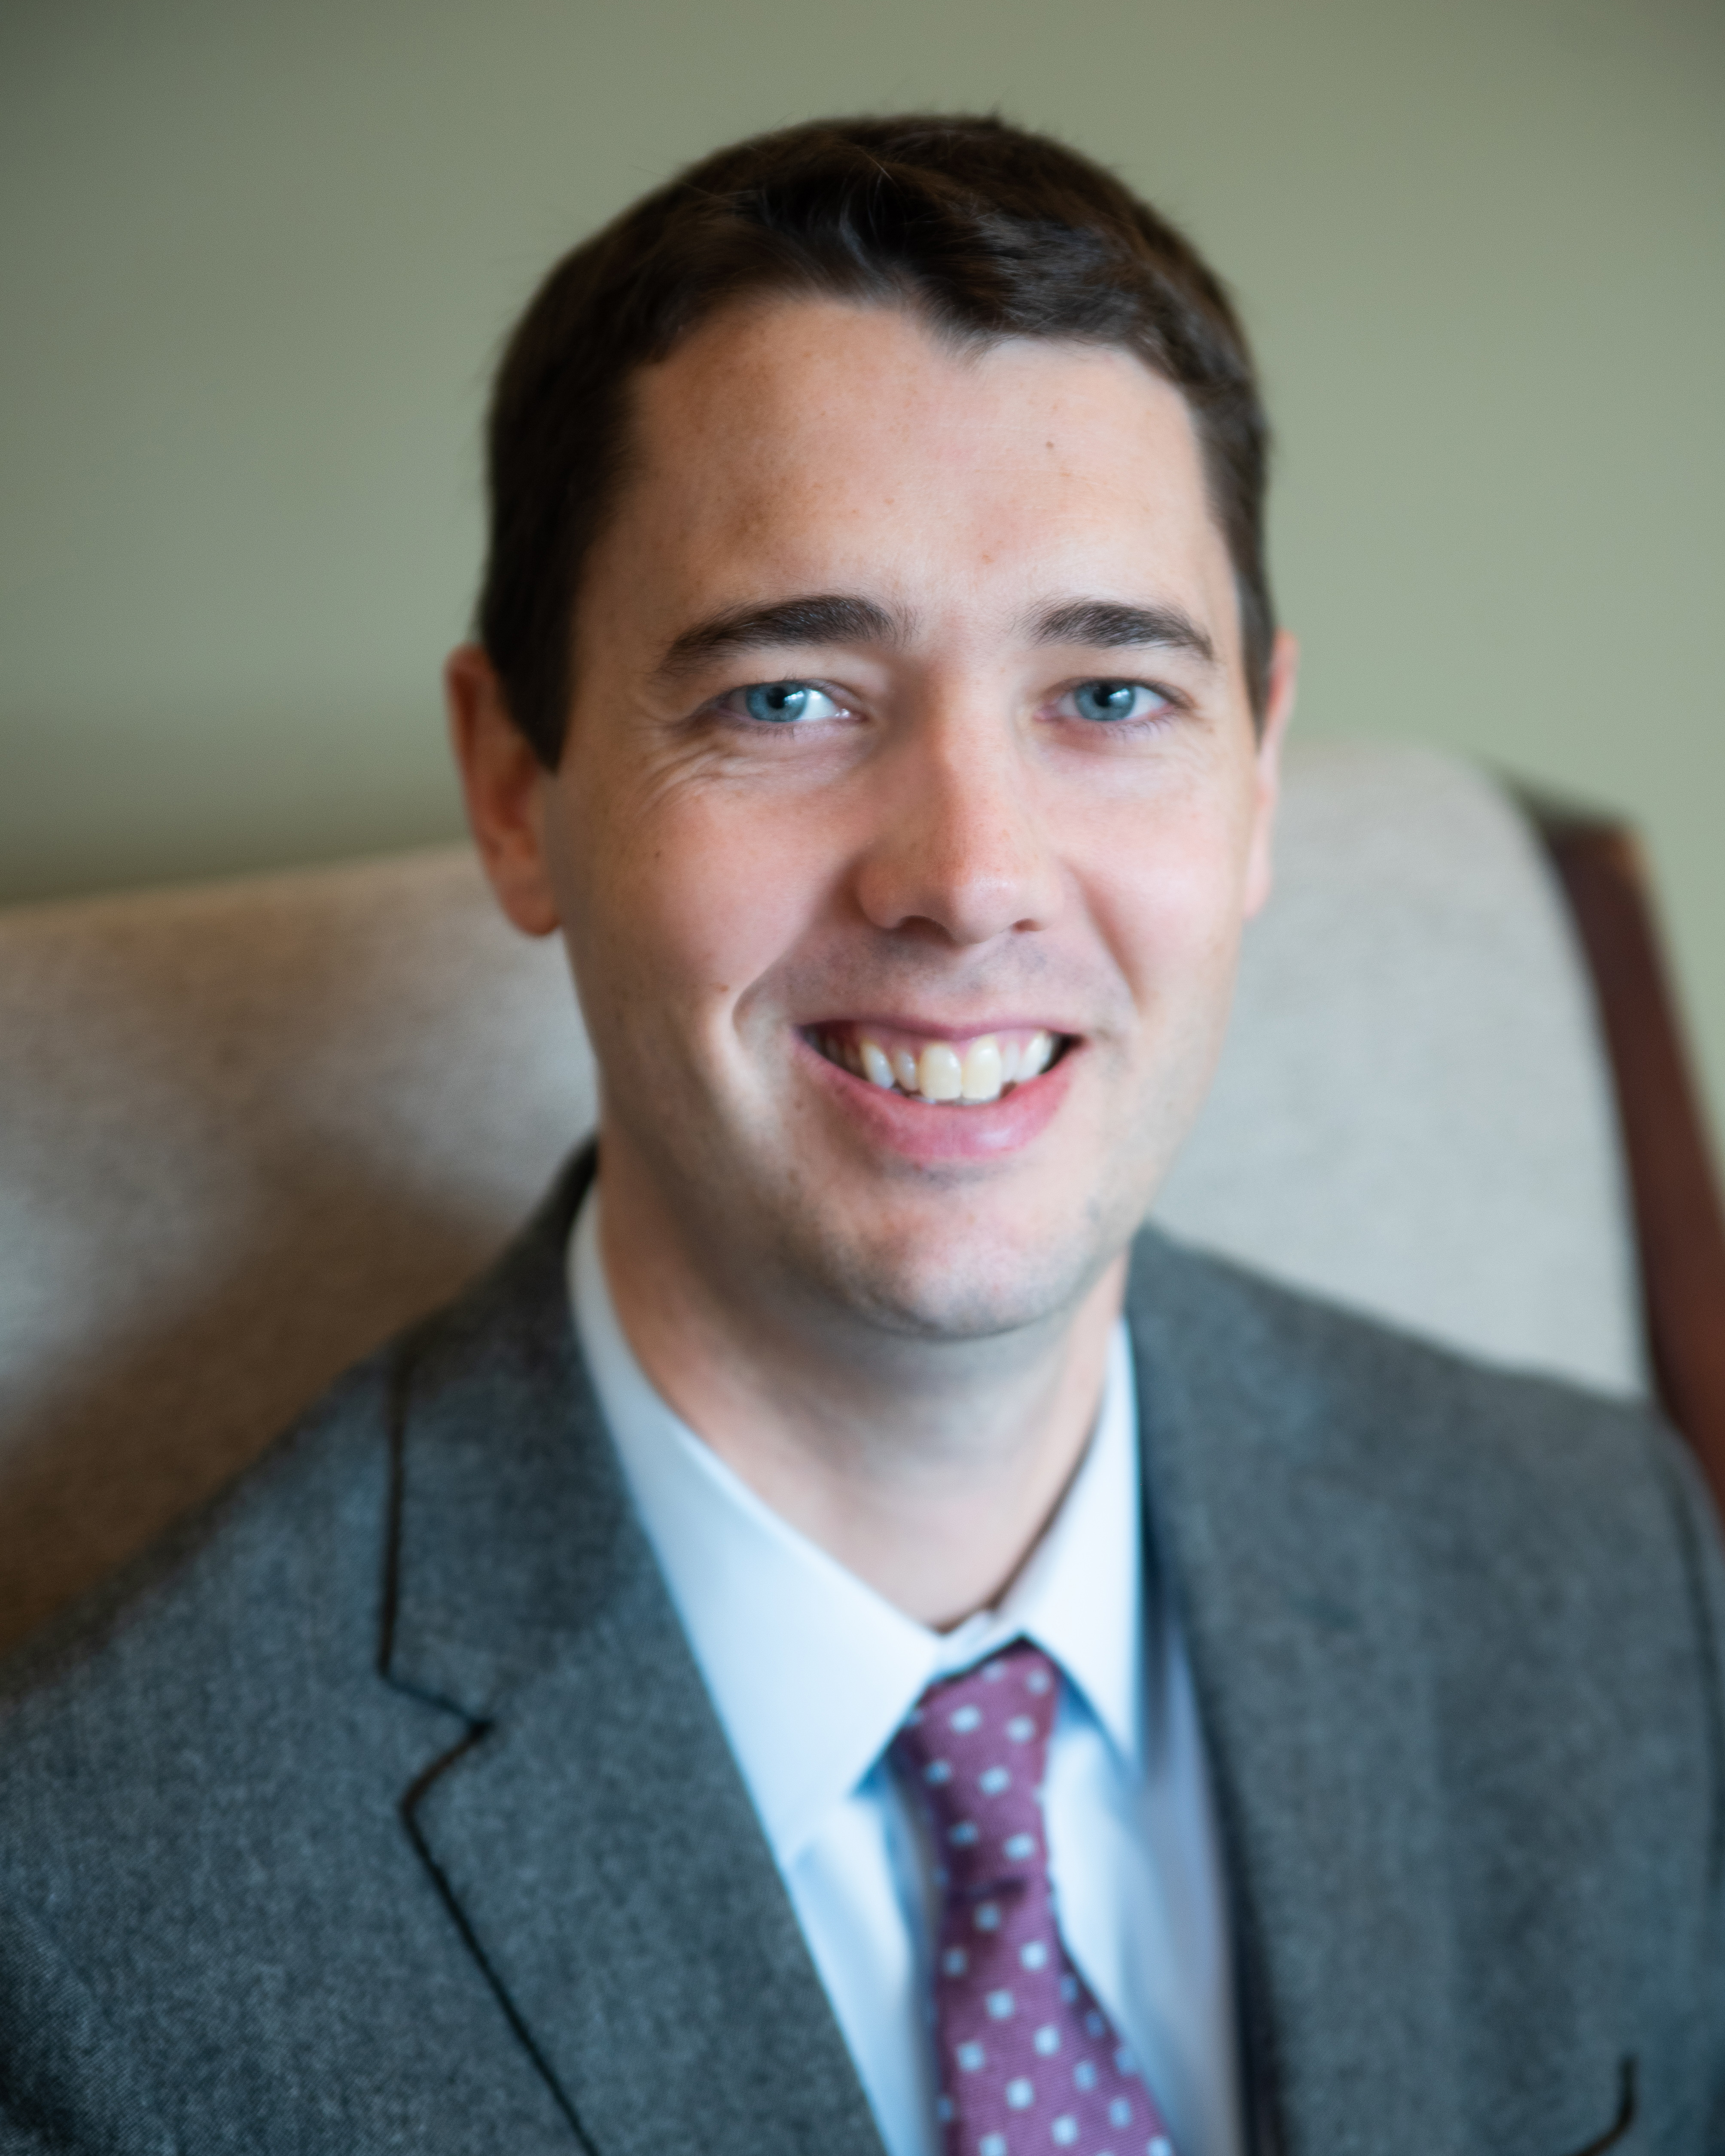 Co-CEO, Matt Groome